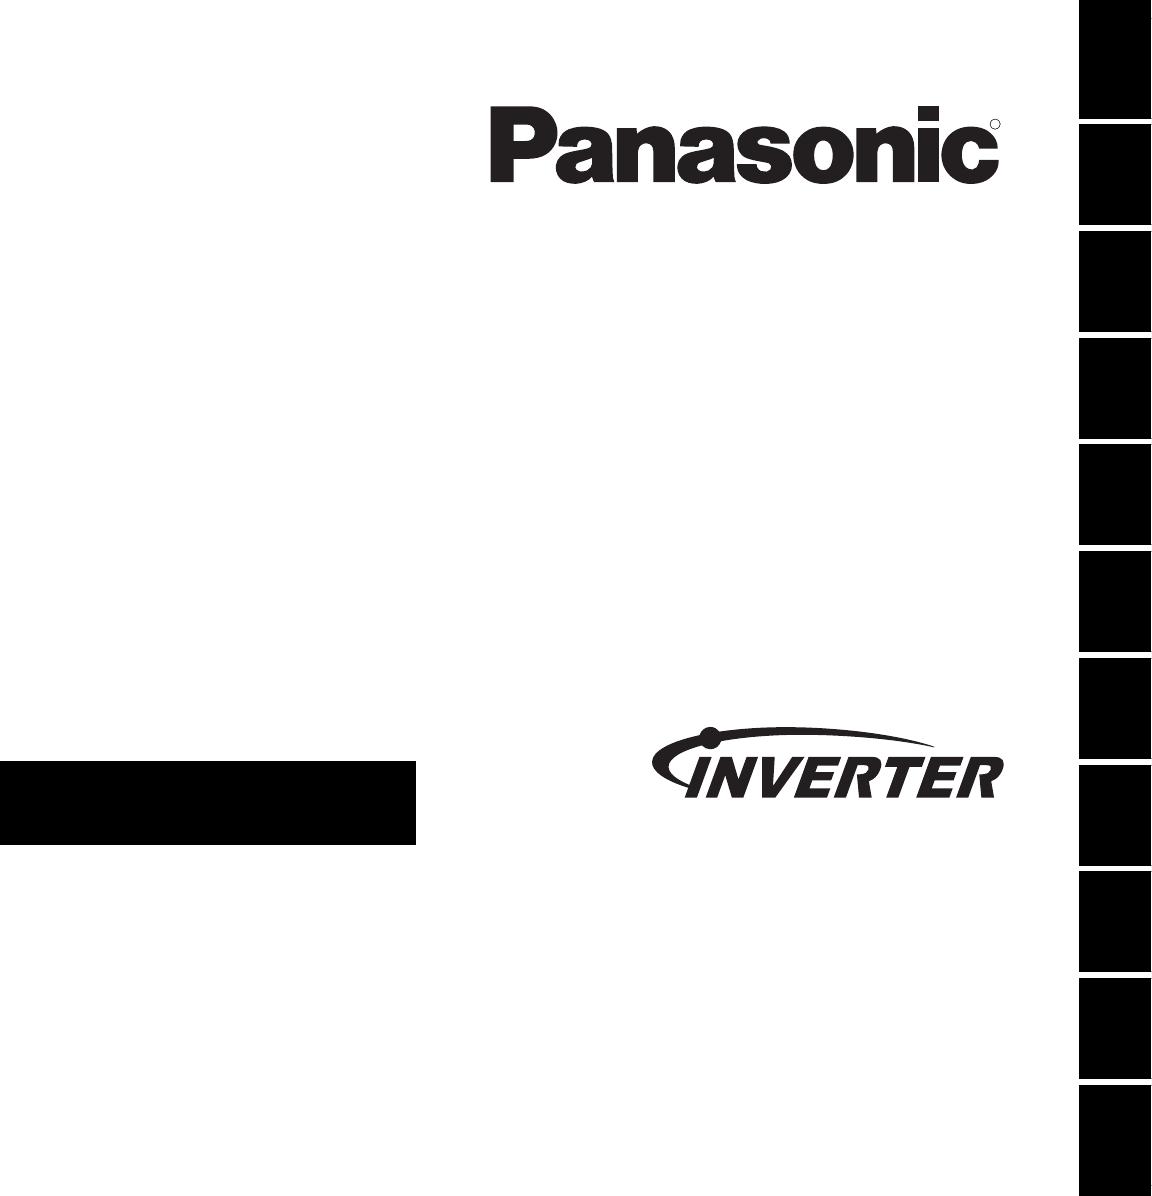 Handleiding Panasonic NN-GD566 (pagina 1 van 43) (Nederlands)